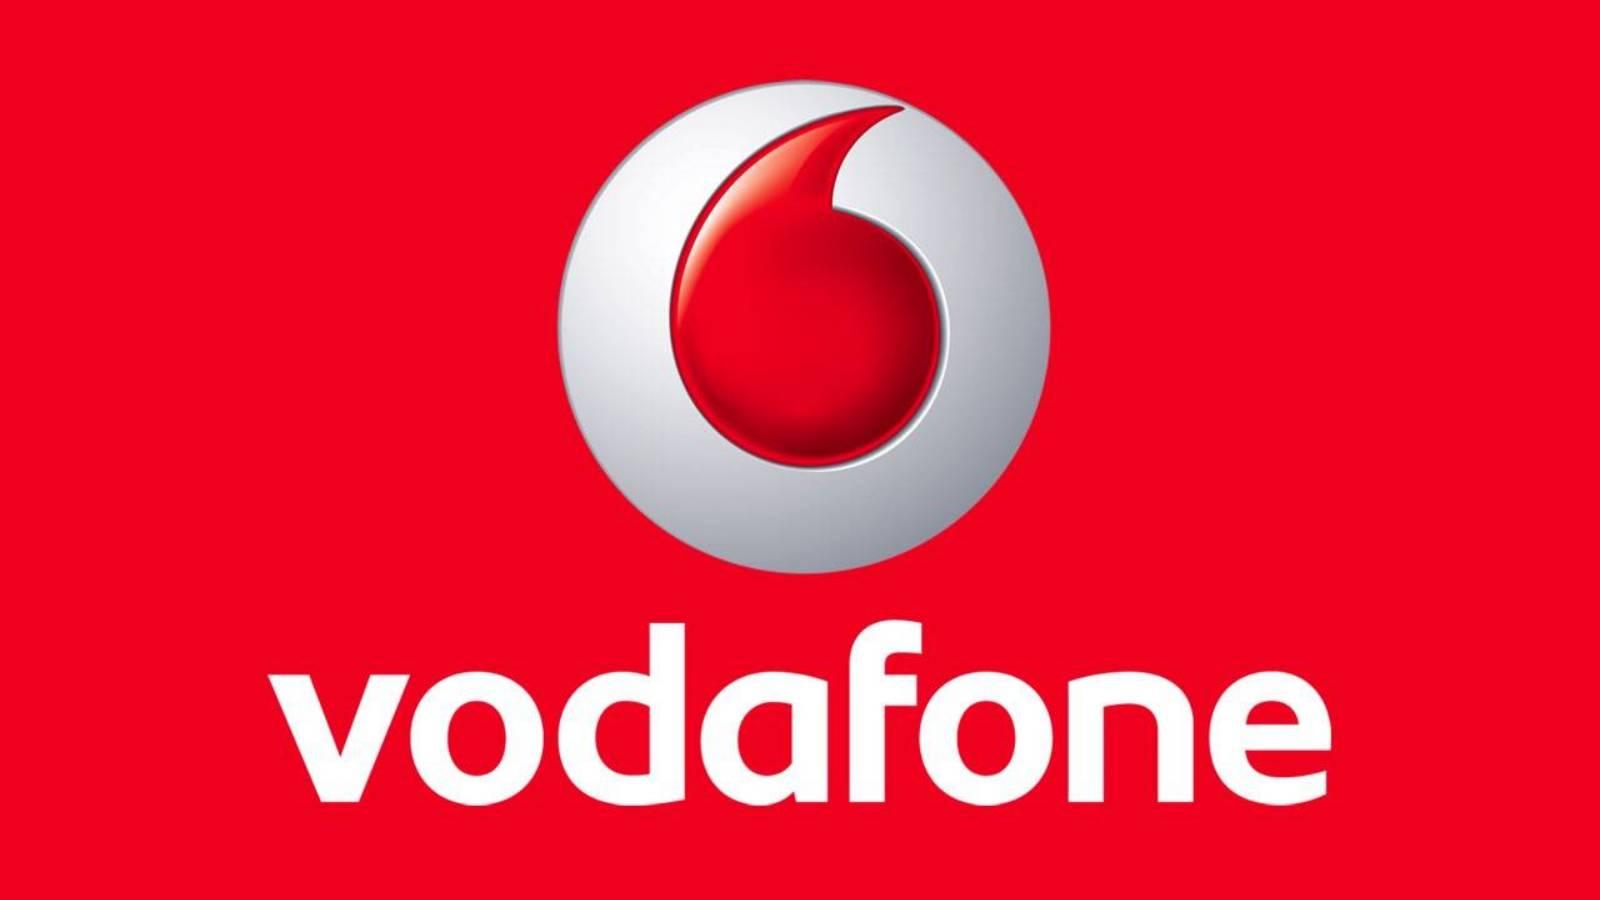 Vodafone daruri